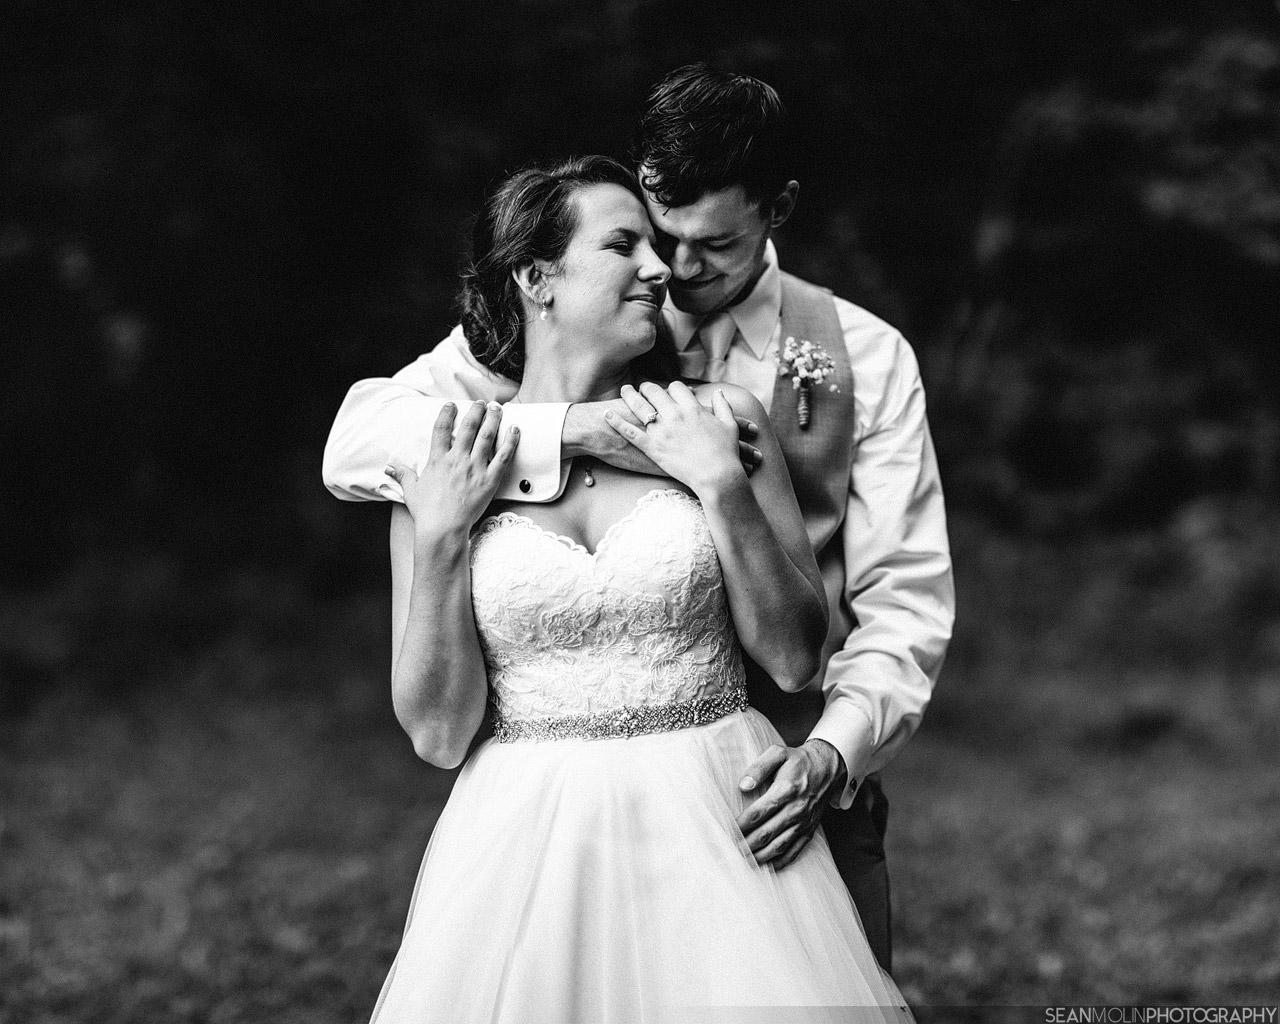 035-bride-groom-black-white-6x7-pentax-67ii-kodak-trix-film-wedding-medium-format.jpg